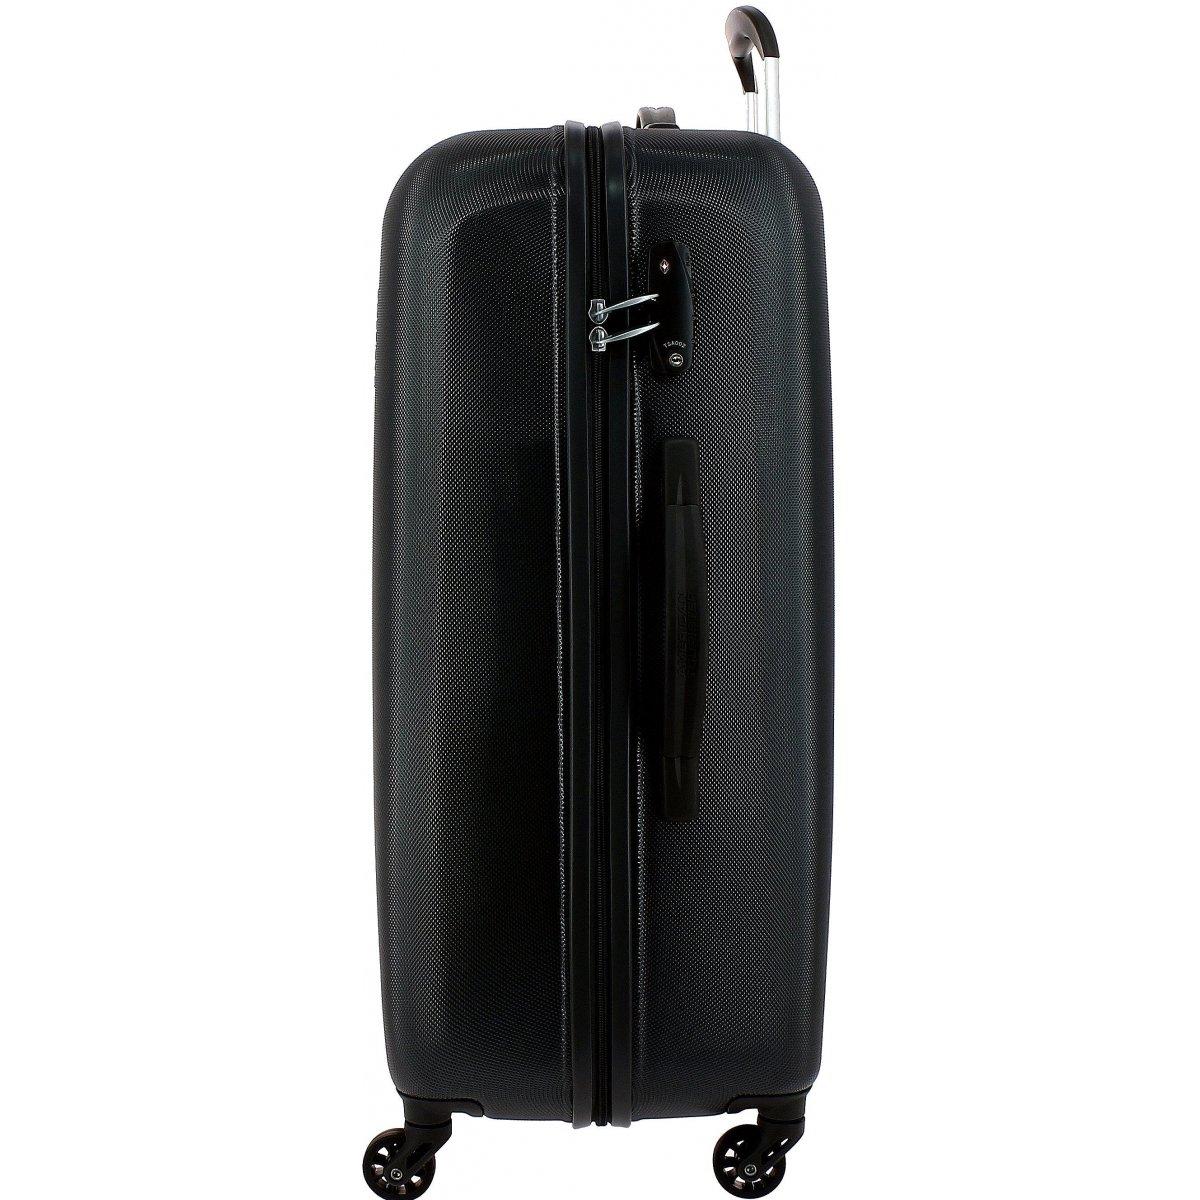 valise american tourister prismo ii spinnerm. Black Bedroom Furniture Sets. Home Design Ideas